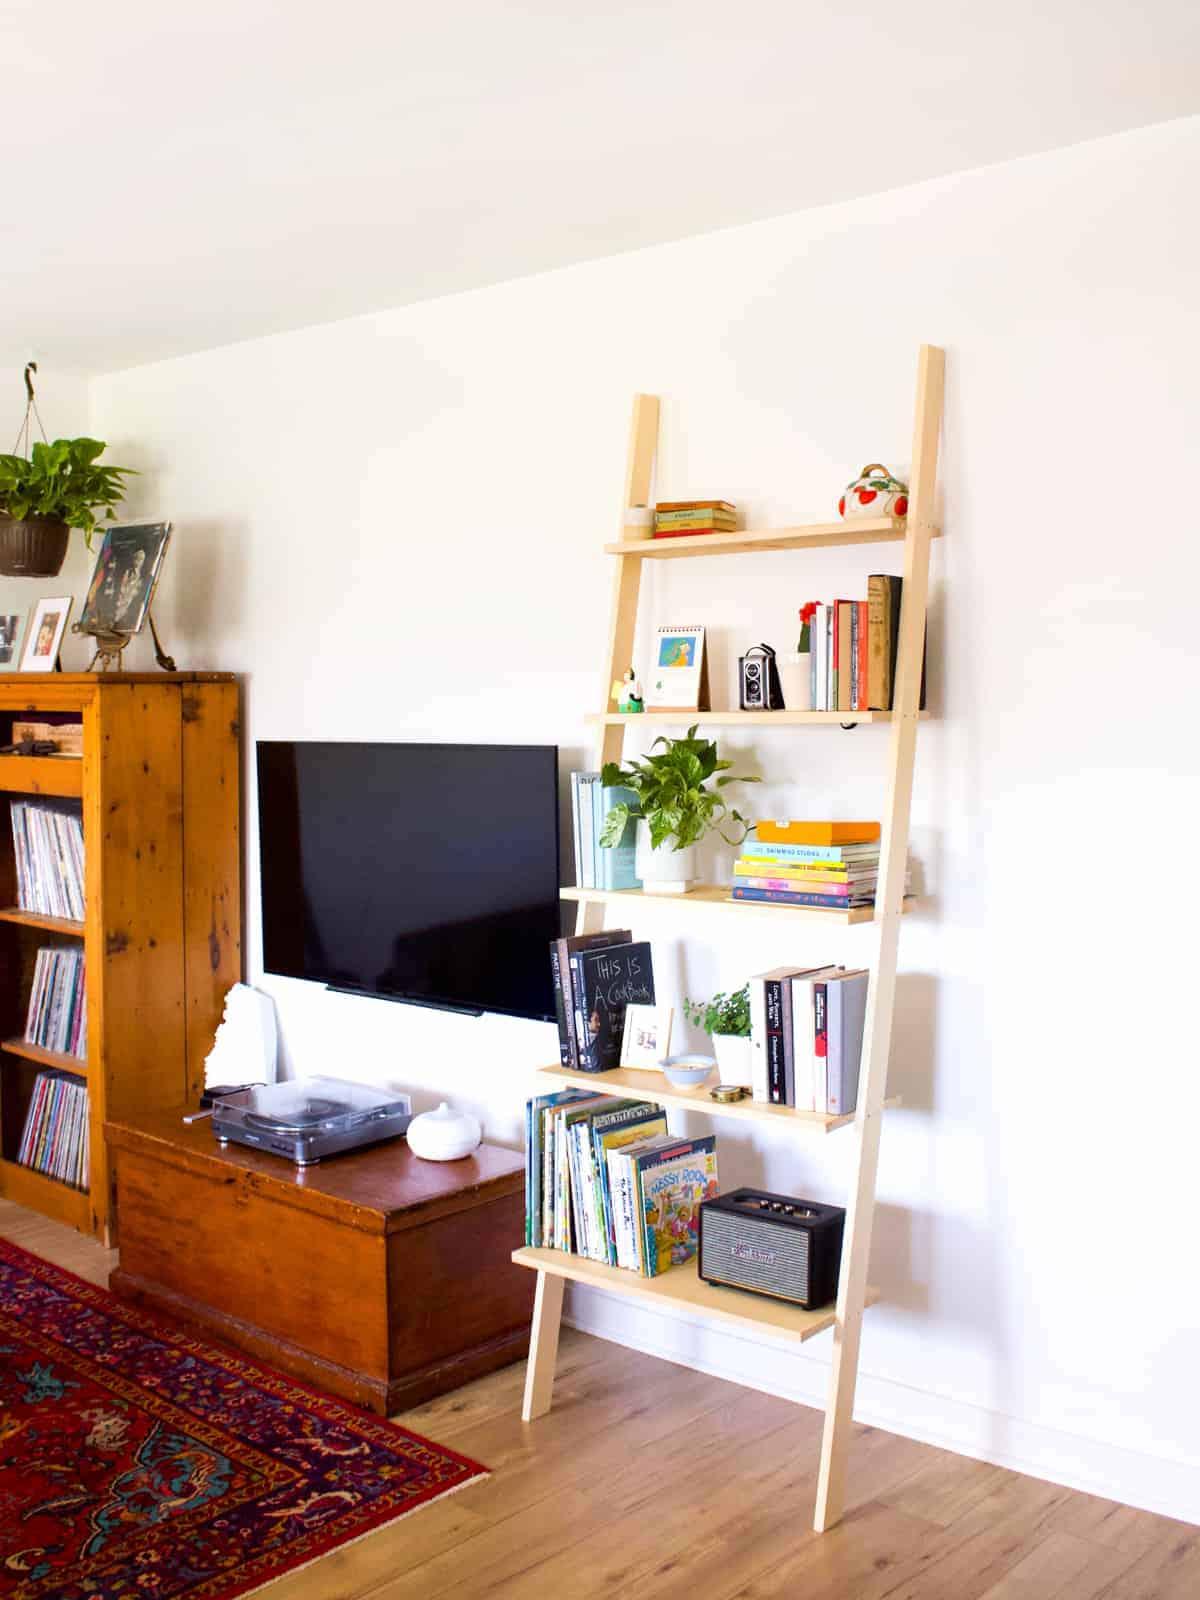 How To Build A Diy Leaning Bookshelf Fish Bull